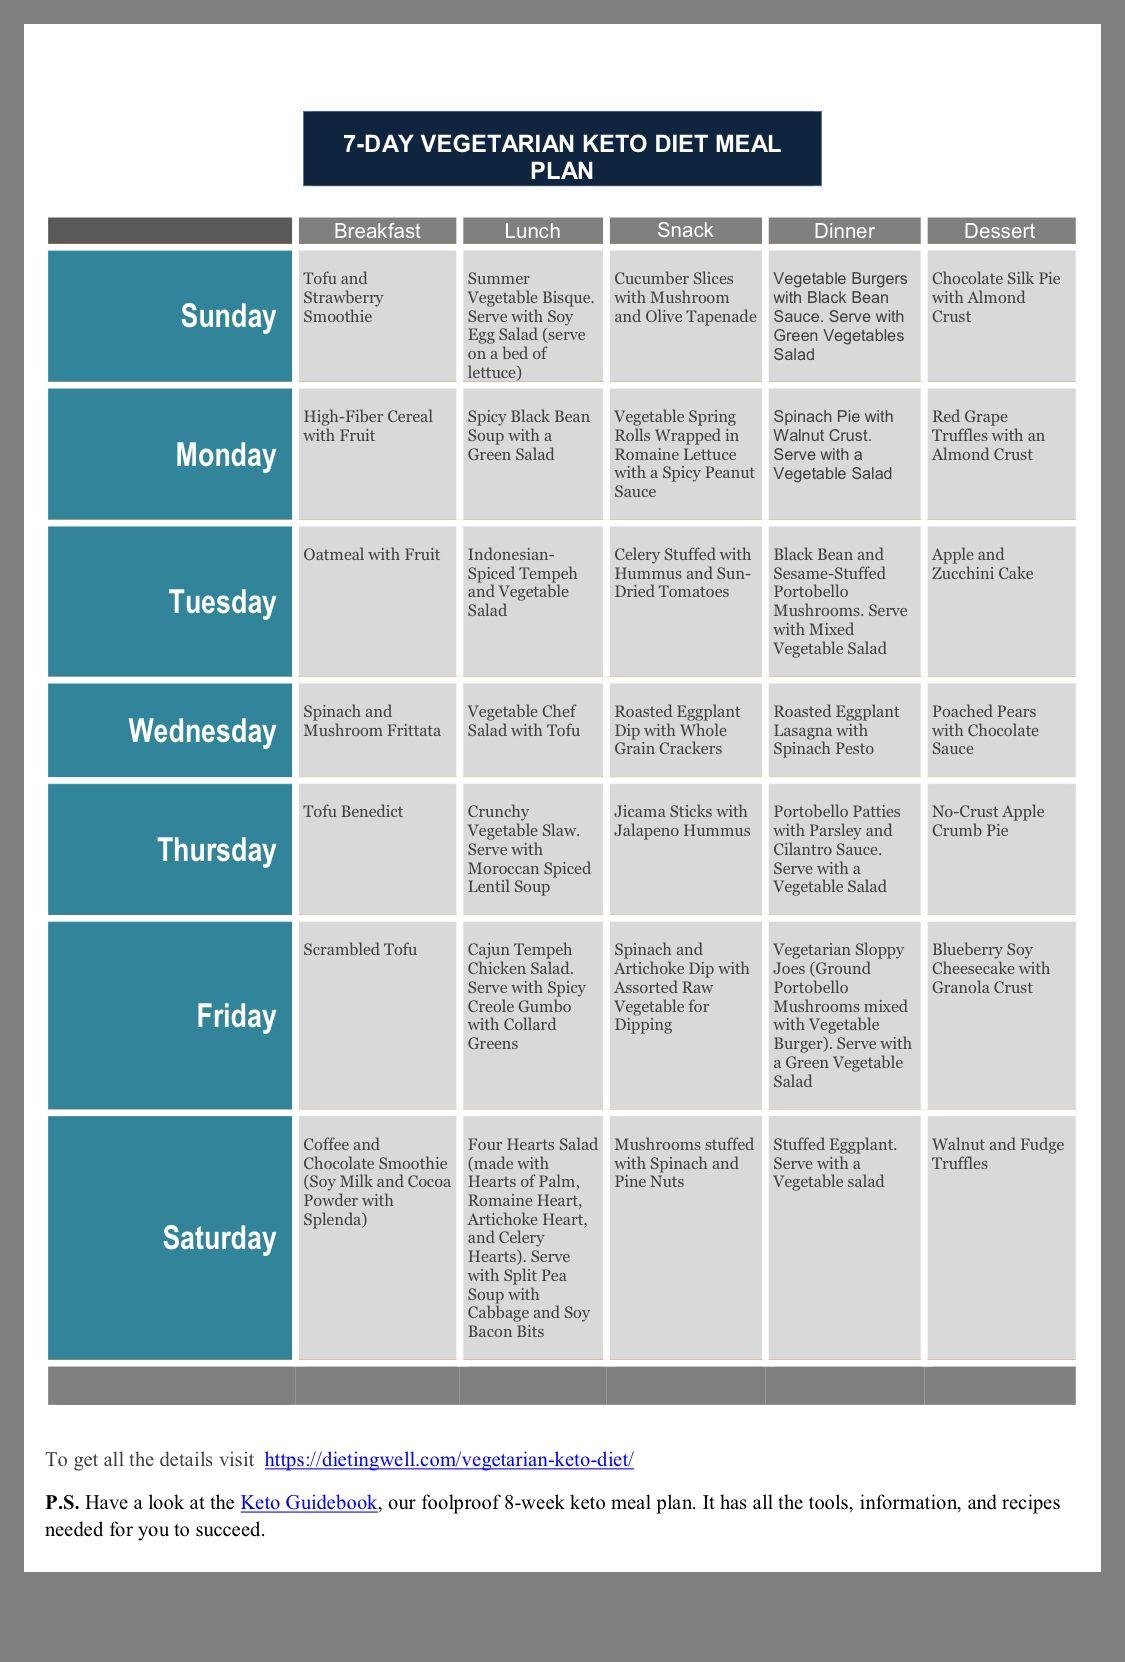 Pin By Crystal Cook On Ketogenic Keto Meal Plan Vegan Keto Detox Meal Plan